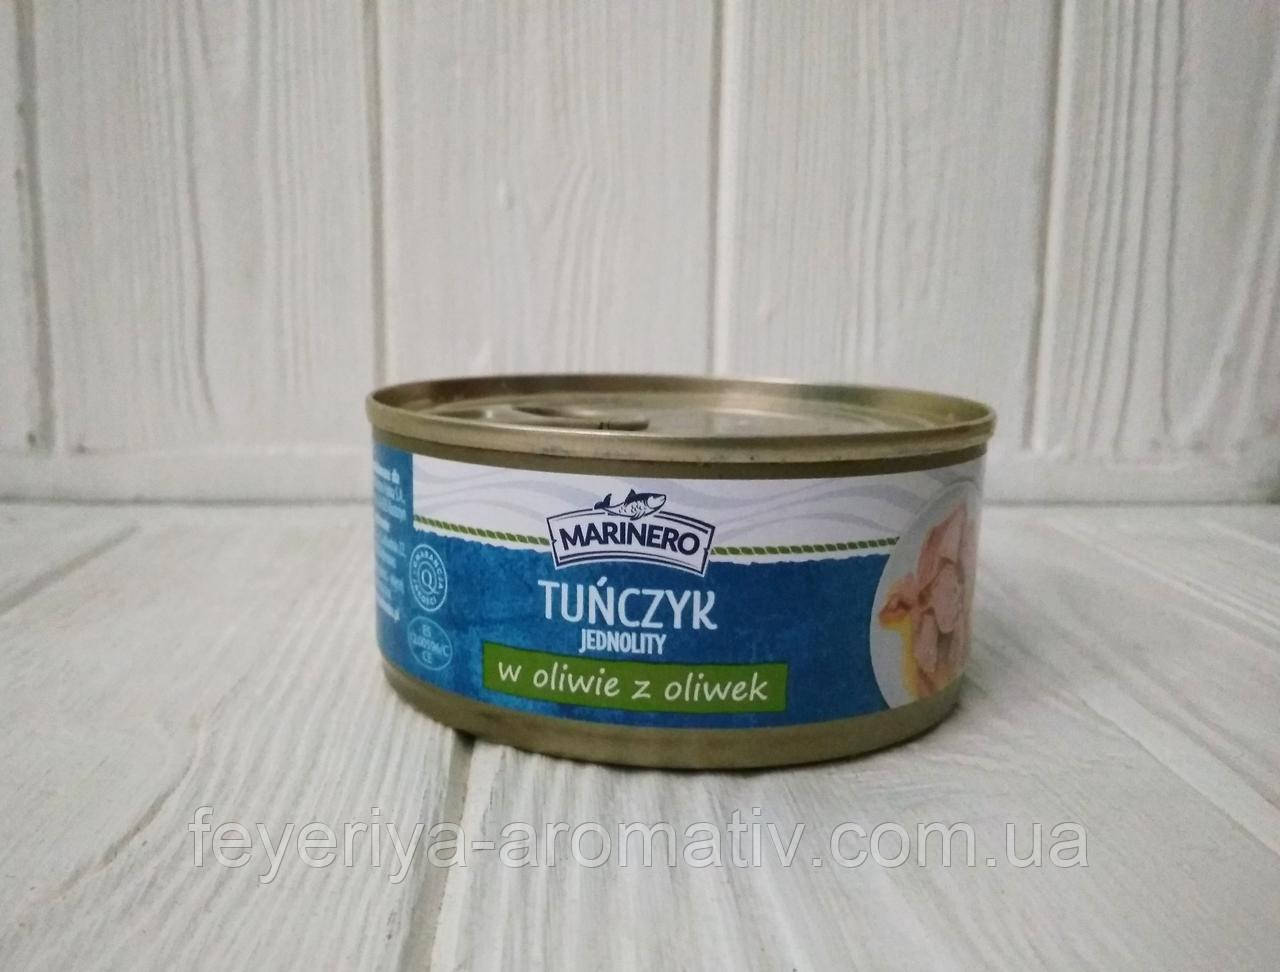 Тунец в оливковом масле Mariero Tunczyk w oliwie z oliwek 160/104гр (Польша)